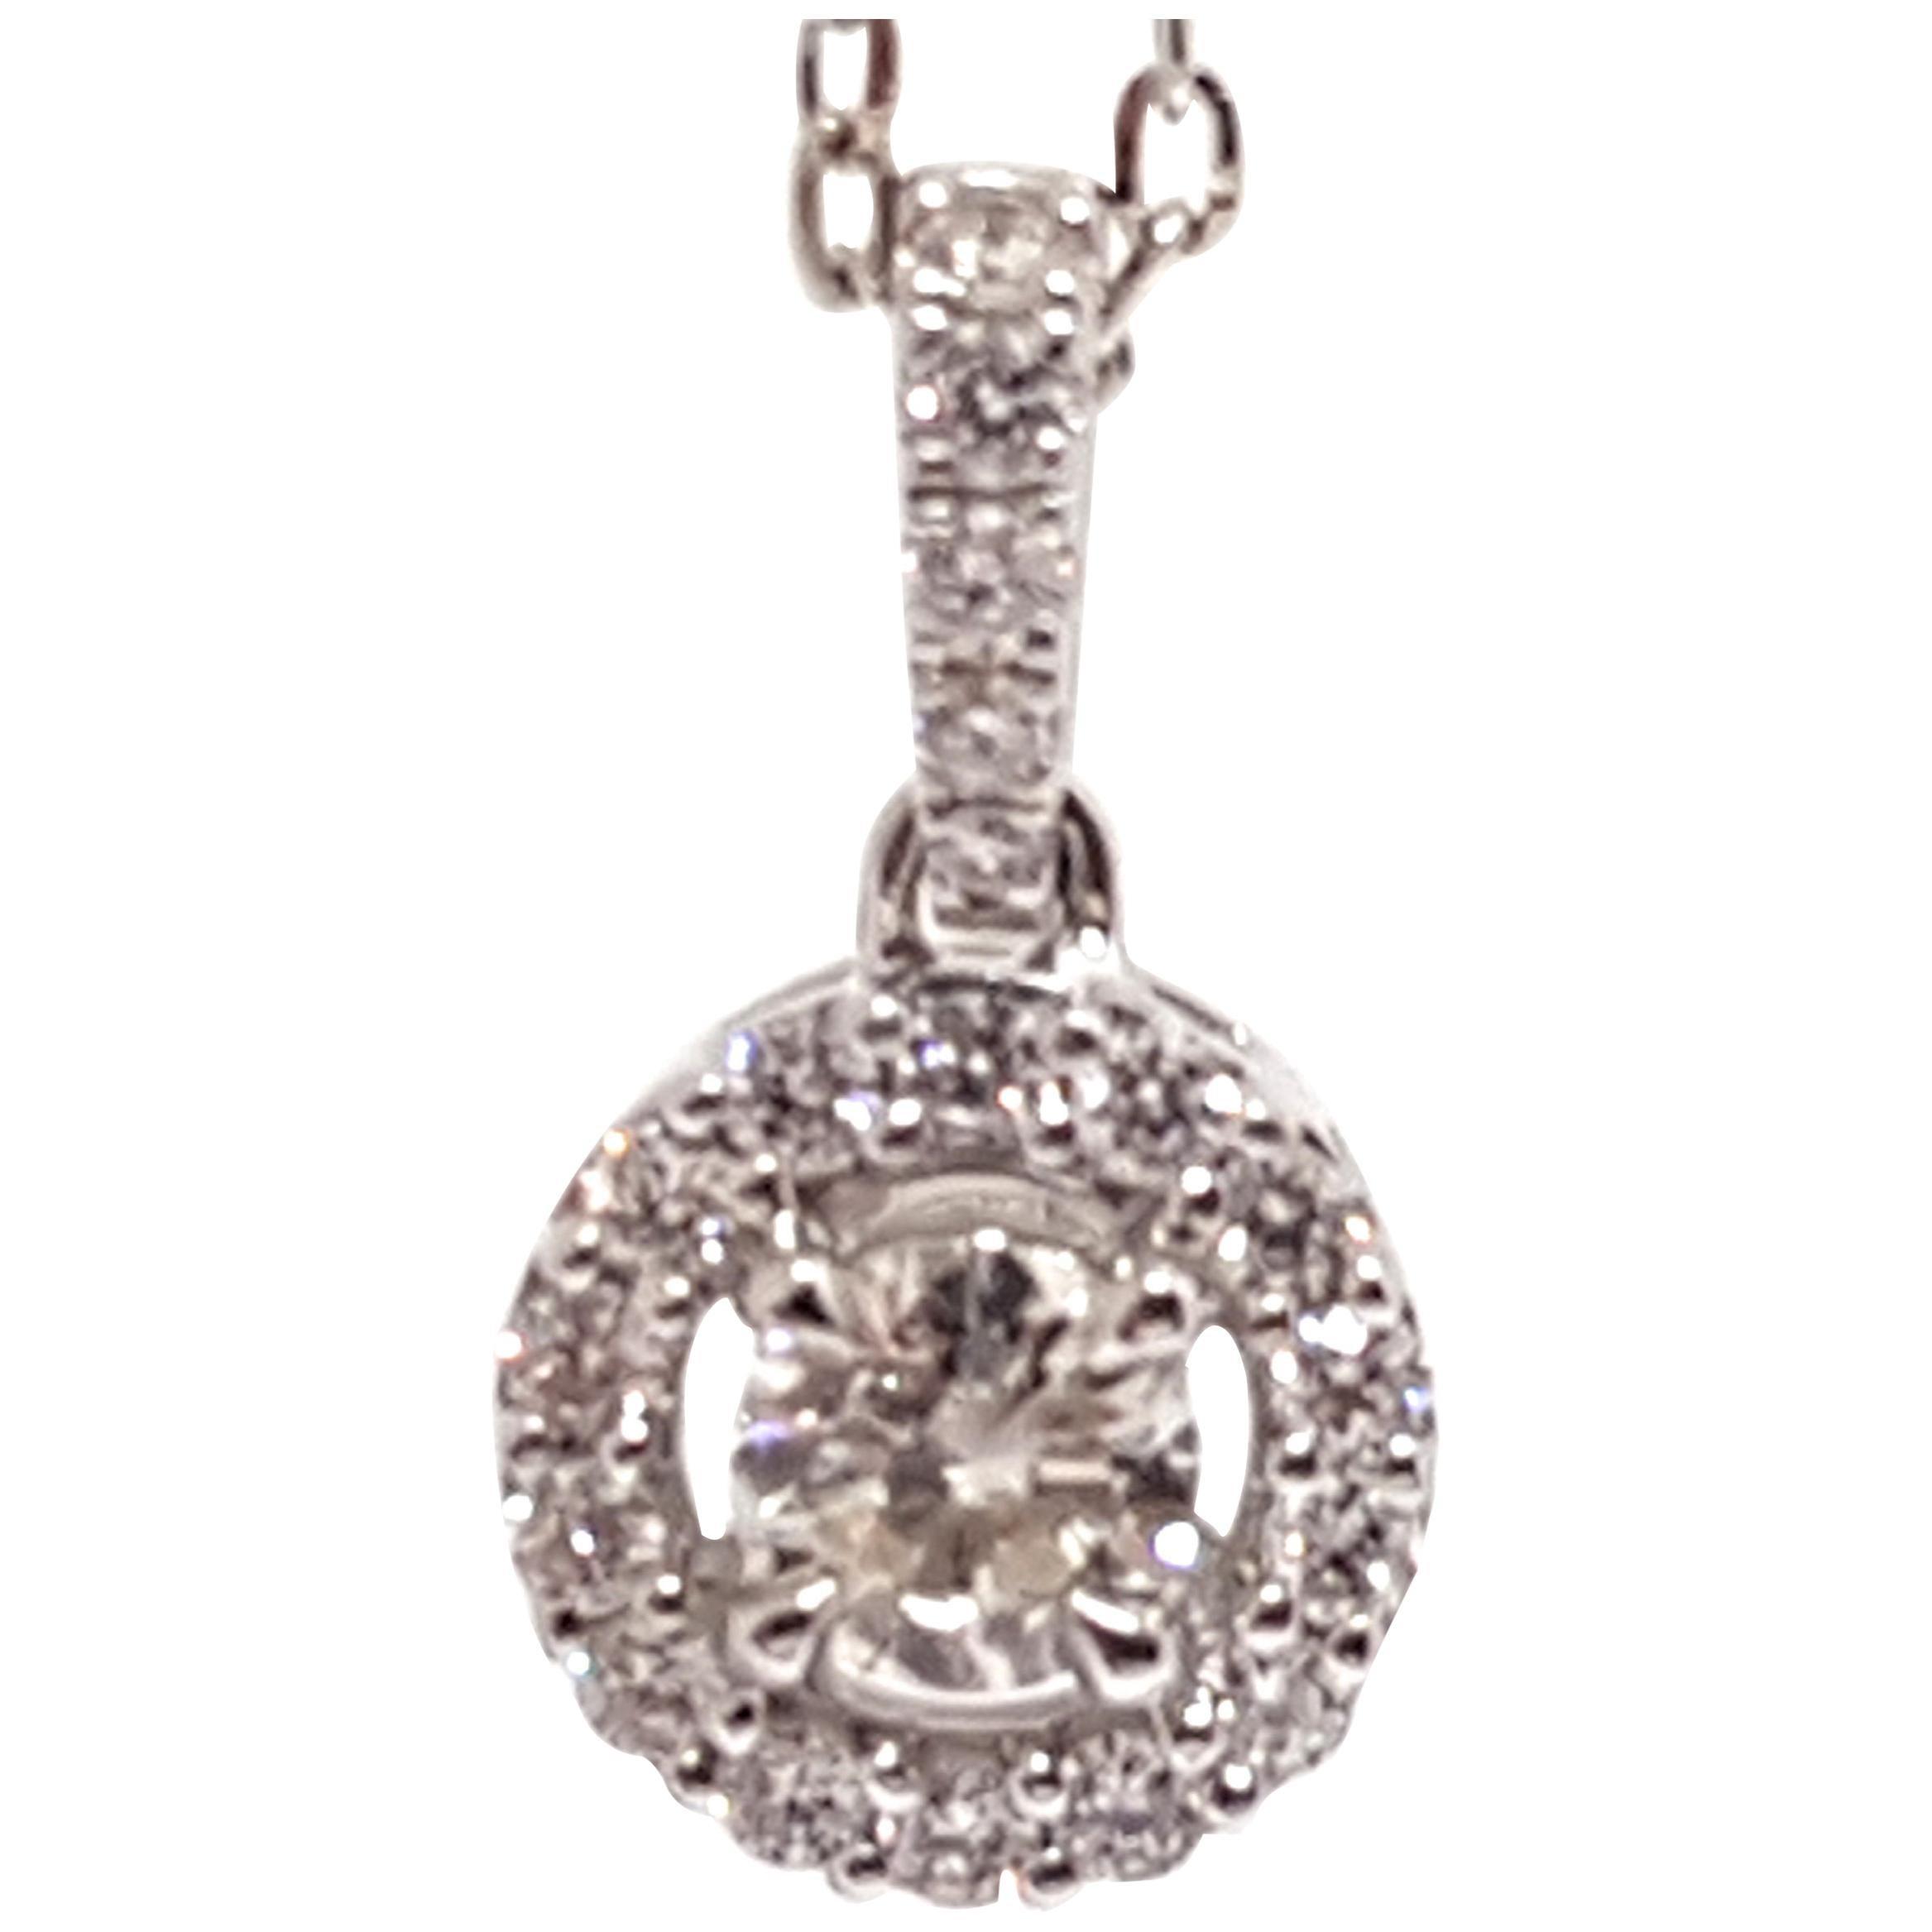 0.95 Carat White Gold Necklace Diamond Halo Solitaire Pendant